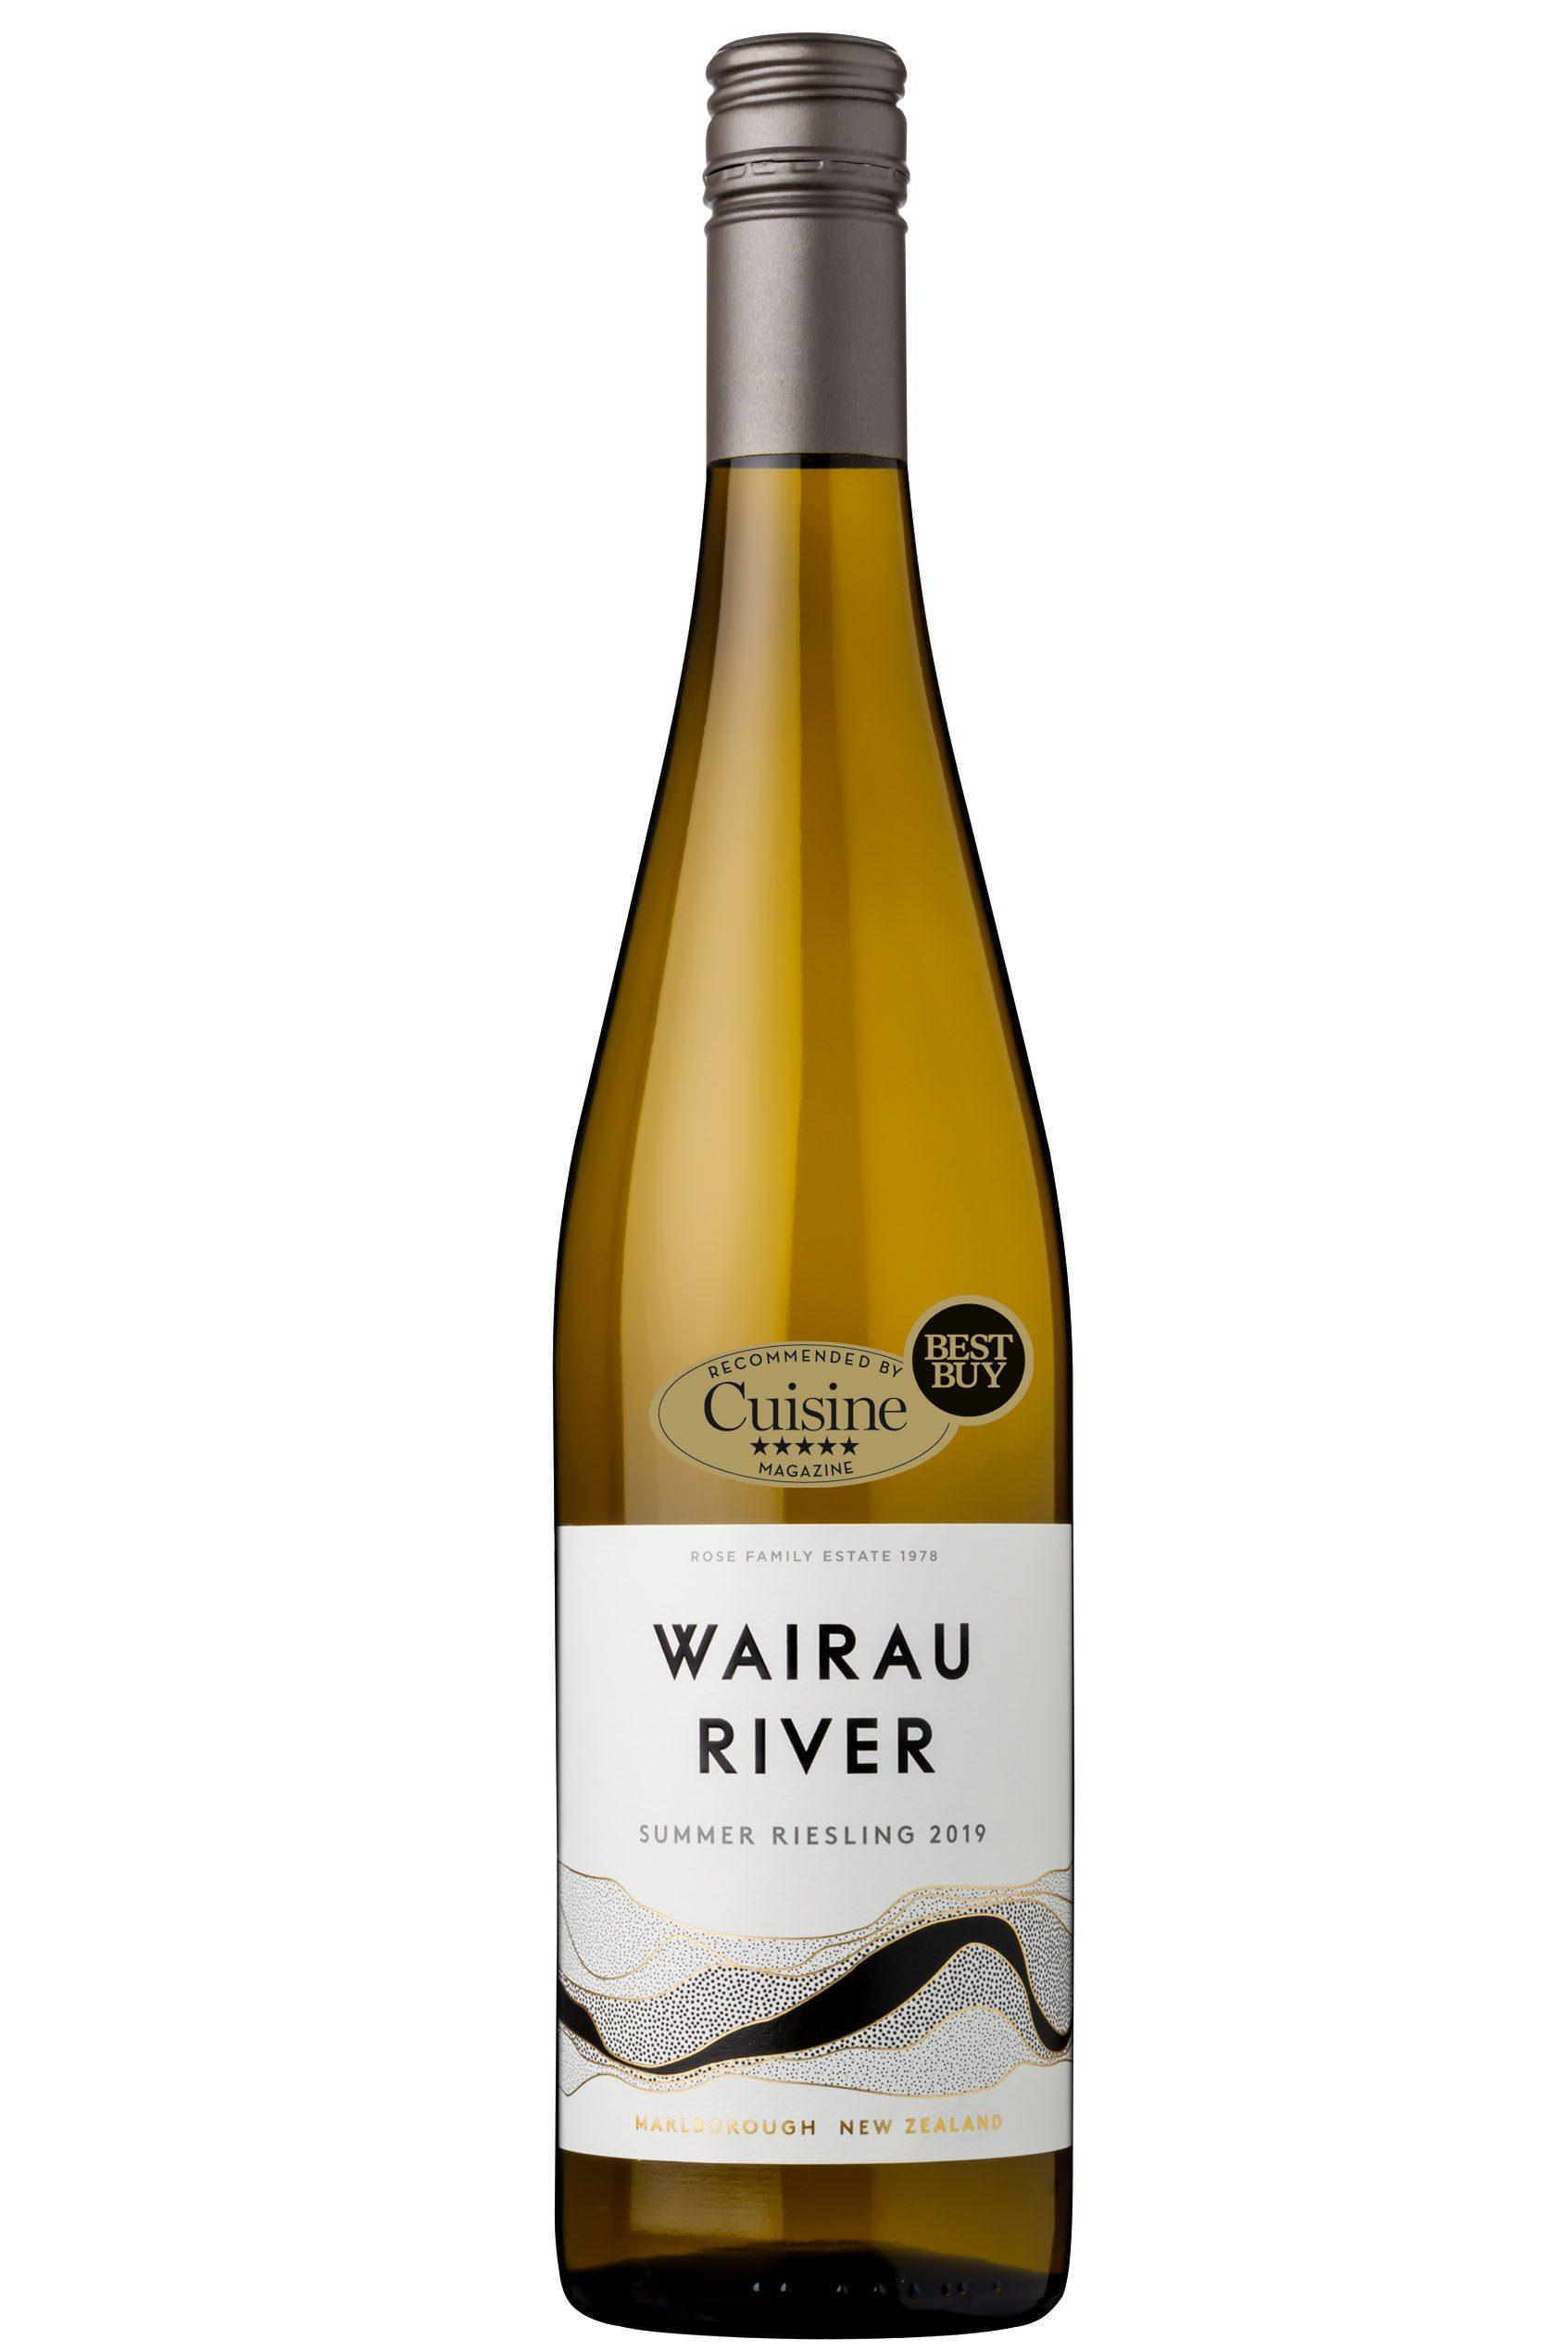 Wairau River Marlborough Summer Riesling 2019